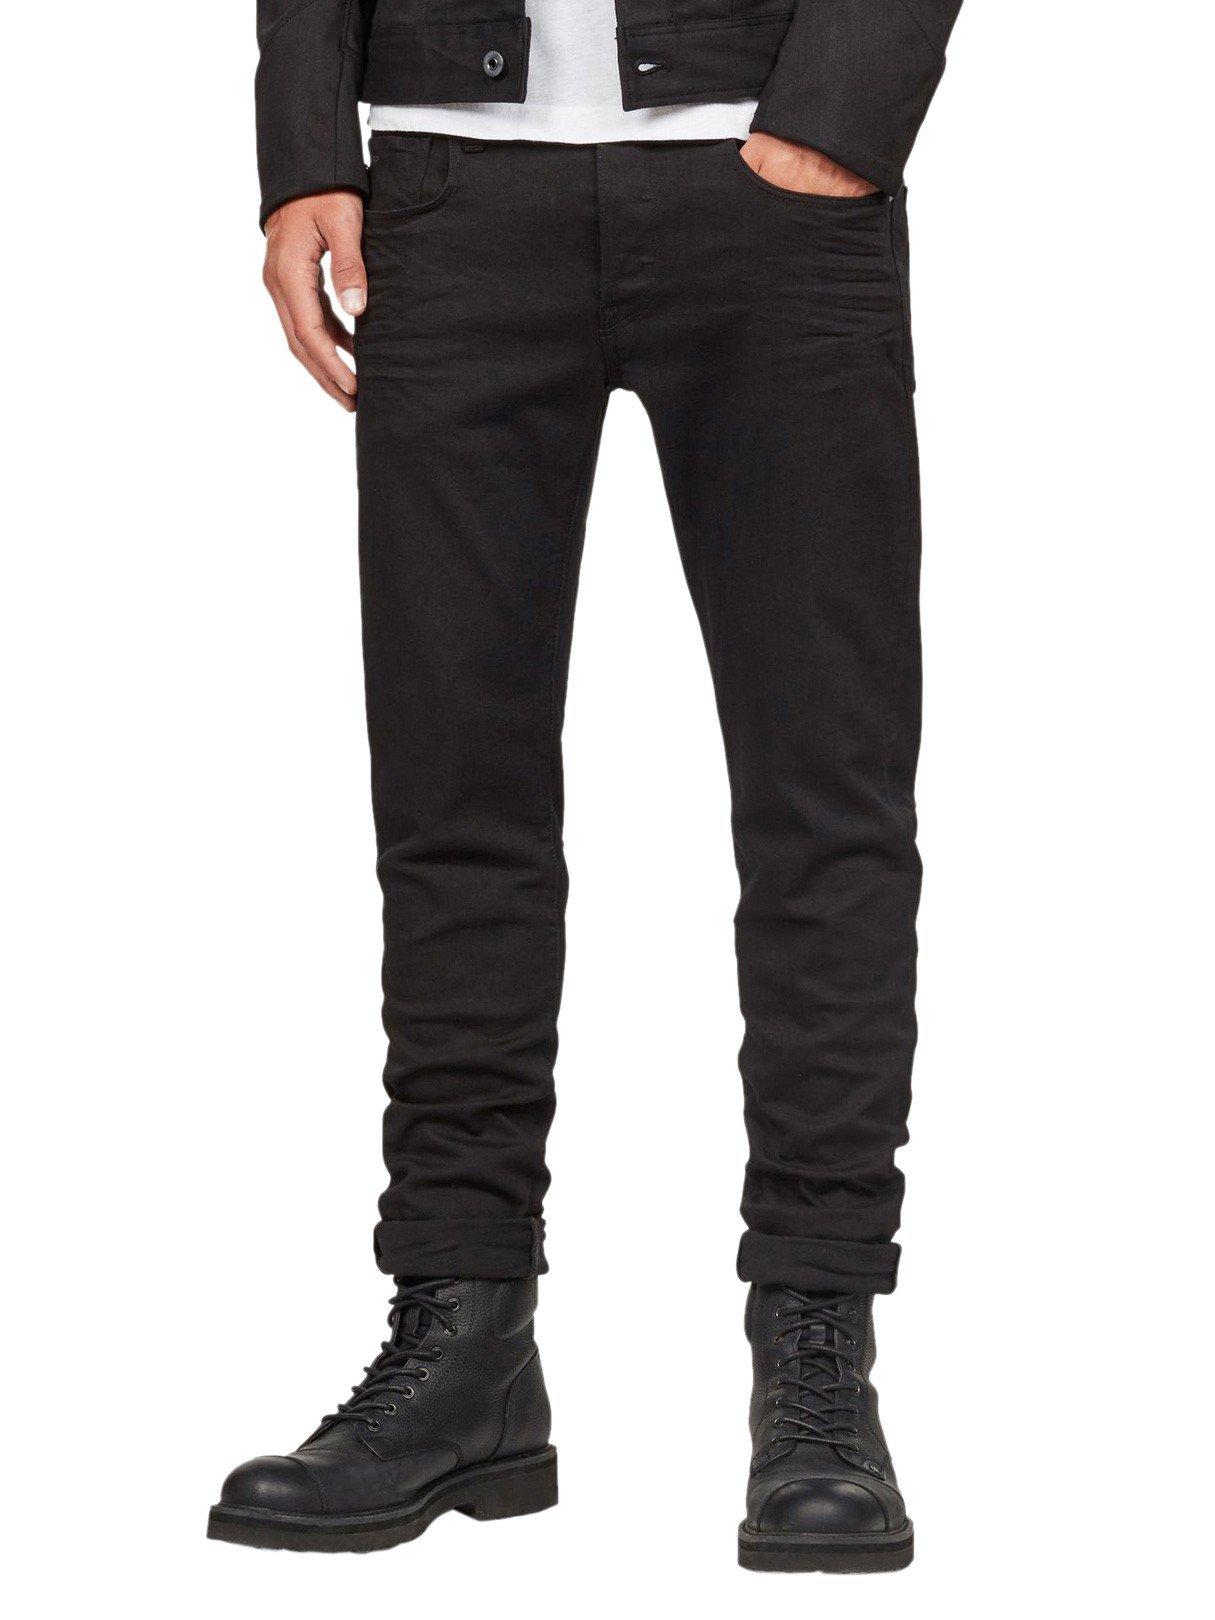 G-Star Raw Men's 3301 Slim Jean in Ita Black Superstretch, Rinsed, 34 x 34